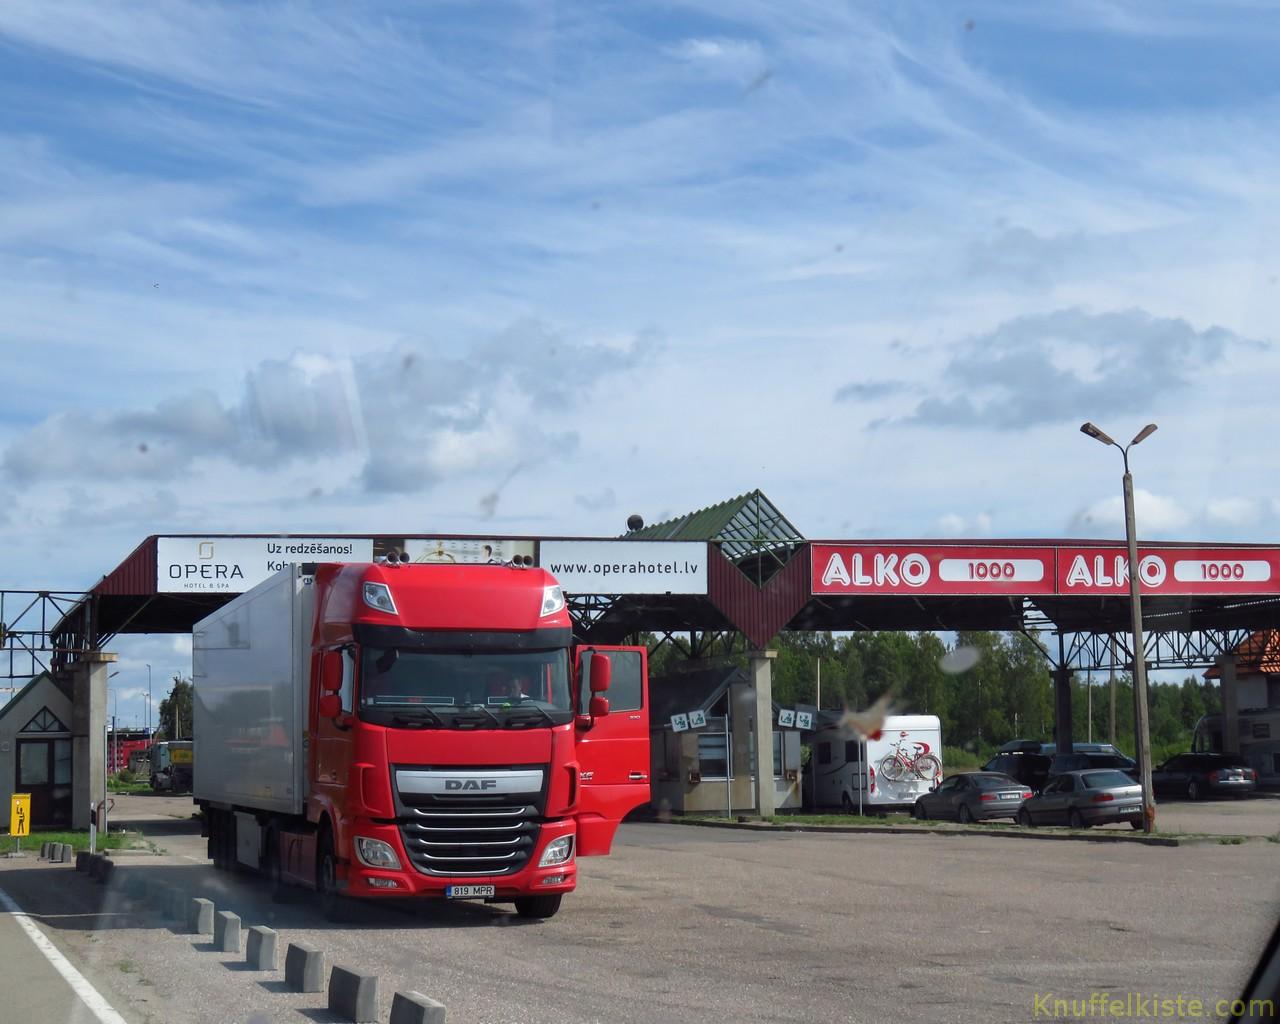 Grenzübergang nach Estland